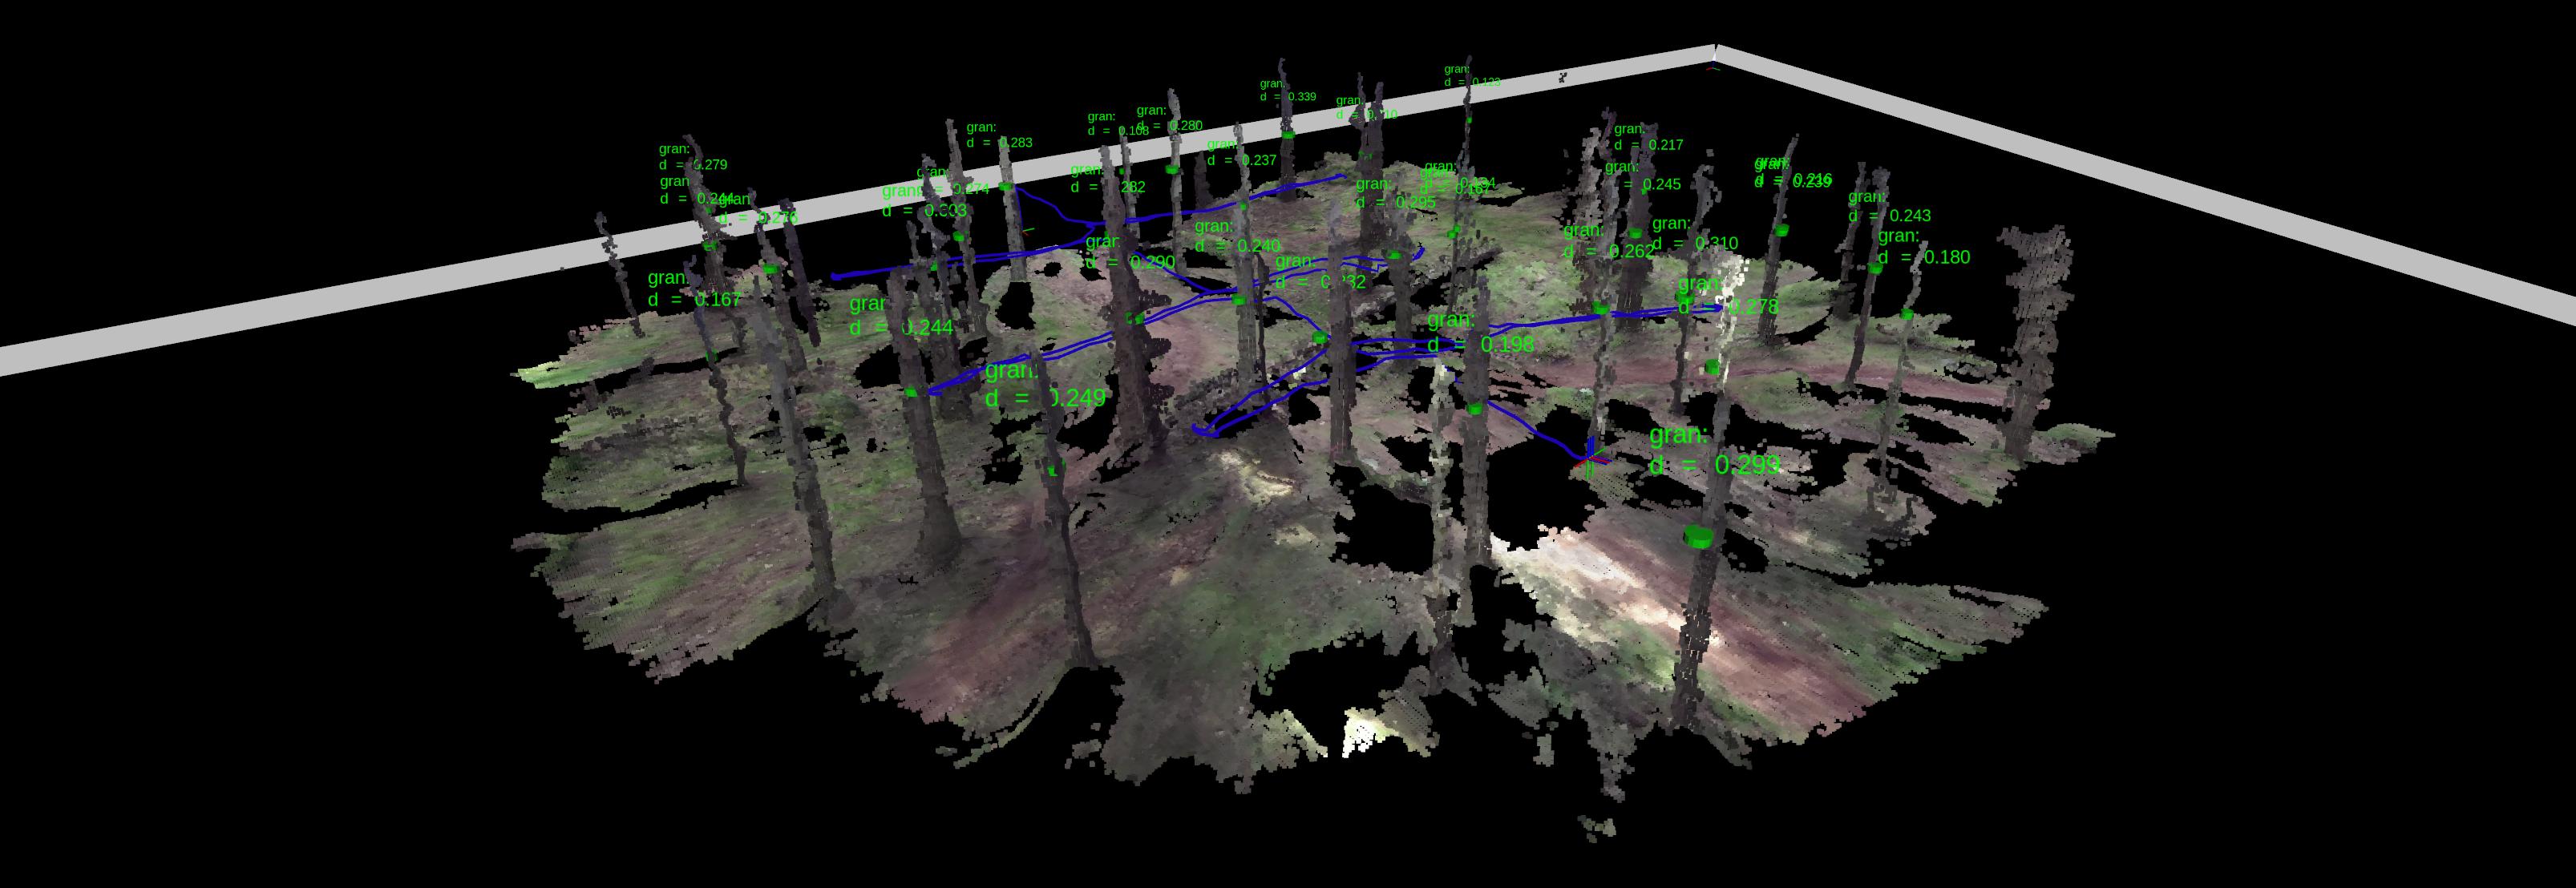 3D-karta, Ant AI